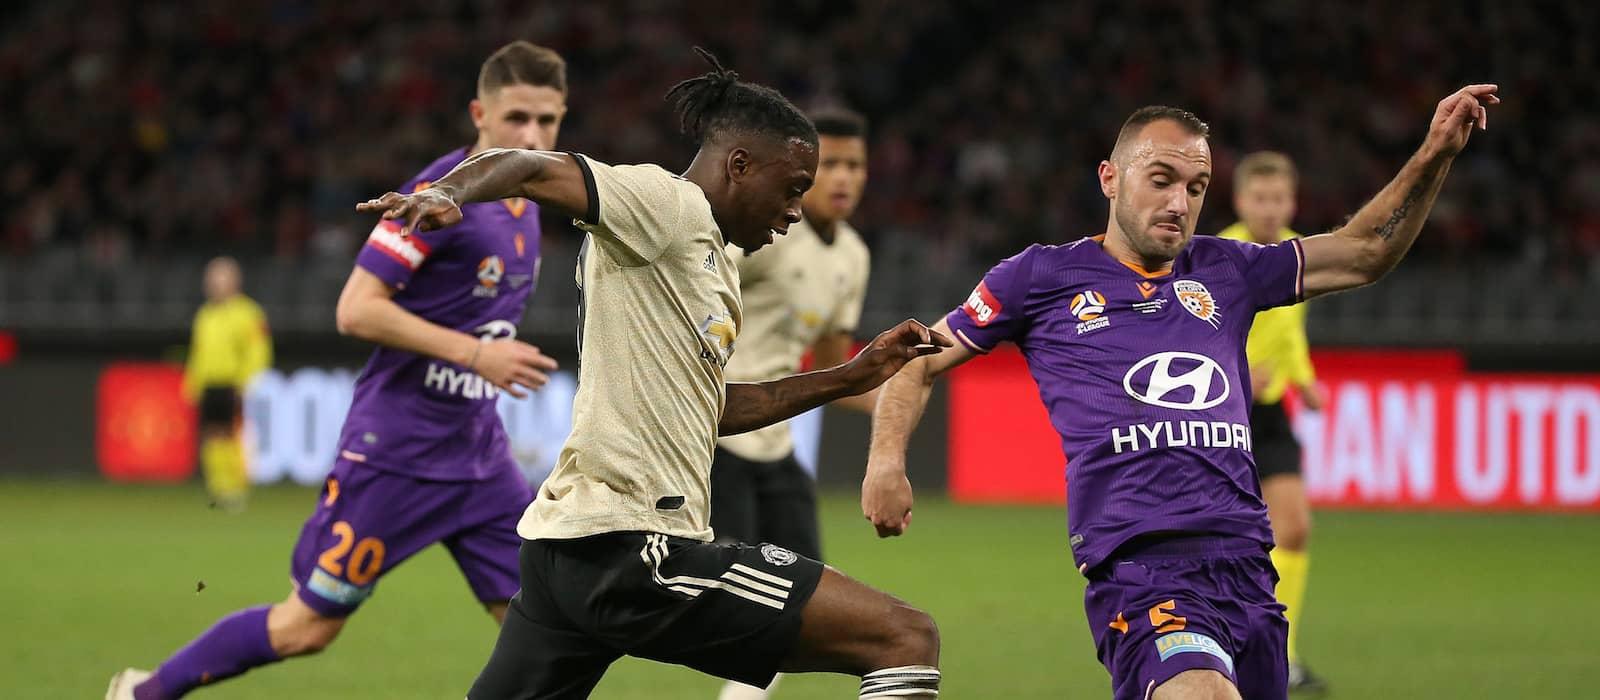 Video: Manchester United fan gets emotional over Aaron Wan-Bissaka